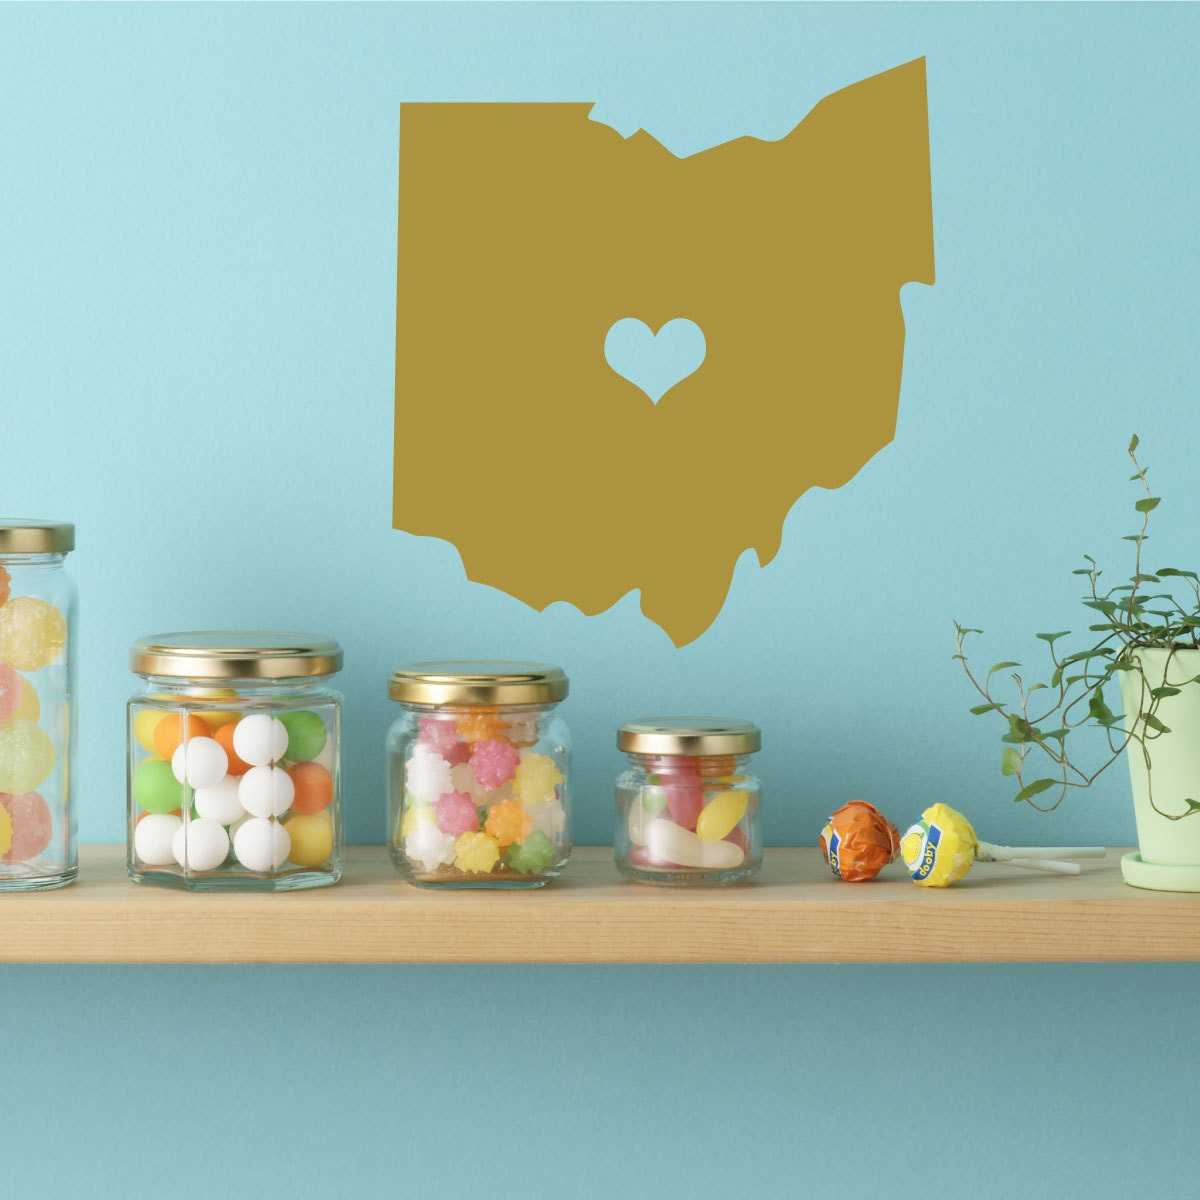 Ohio State Decal - Vinyl Wall Decor, Columbus Ohio, Buckeye State ...